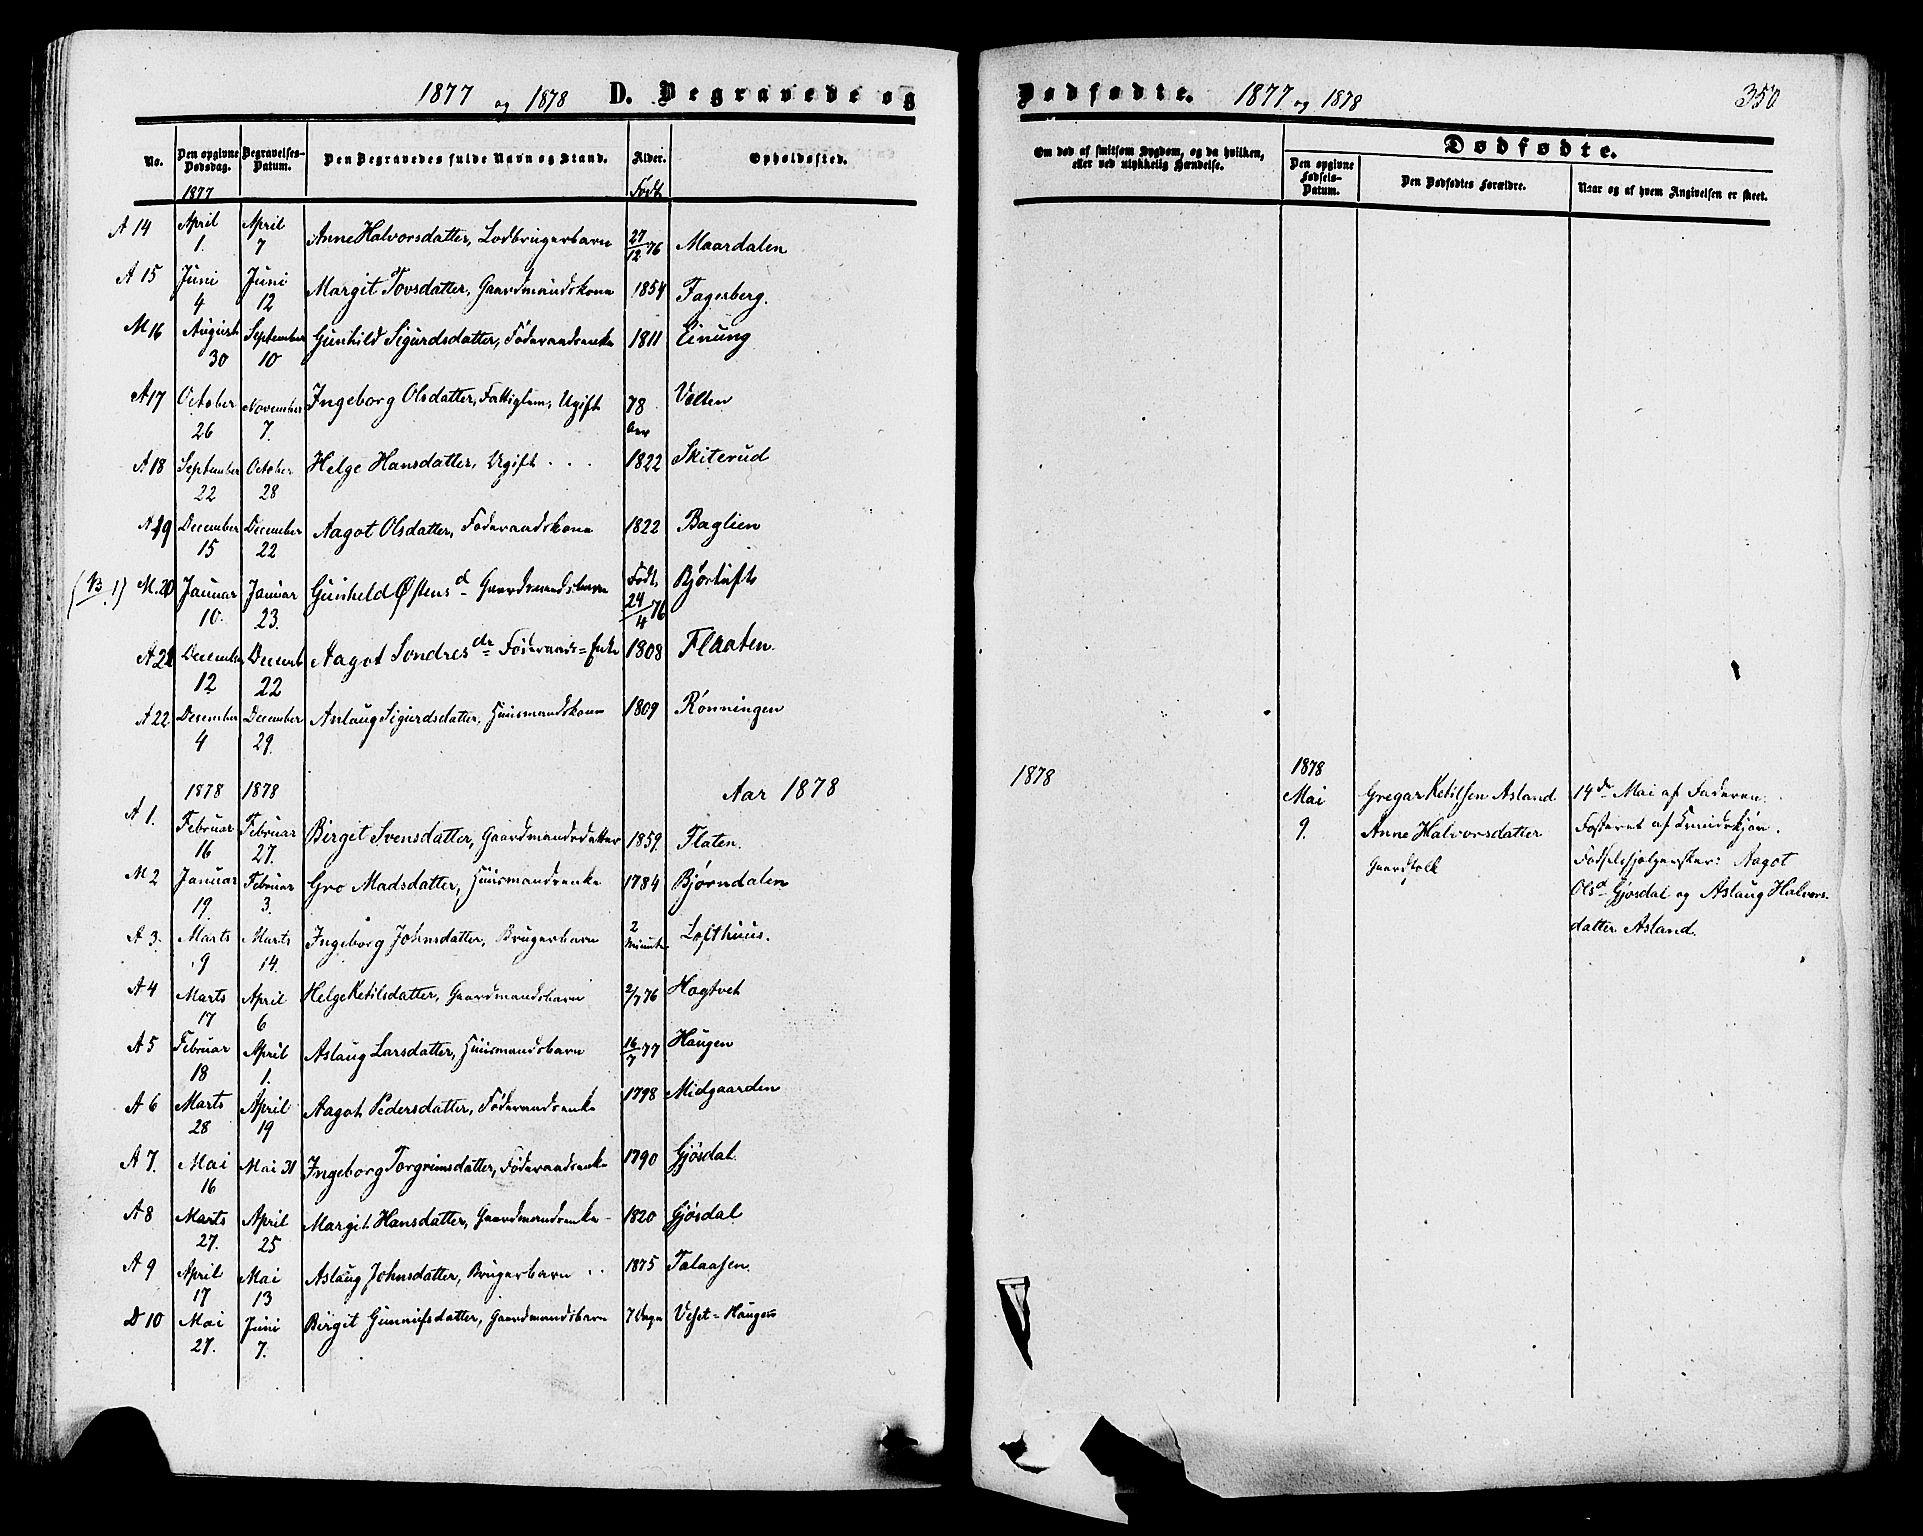 SAKO, Tinn kirkebøker, F/Fa/L0006: Ministerialbok nr. I 6, 1857-1878, s. 350